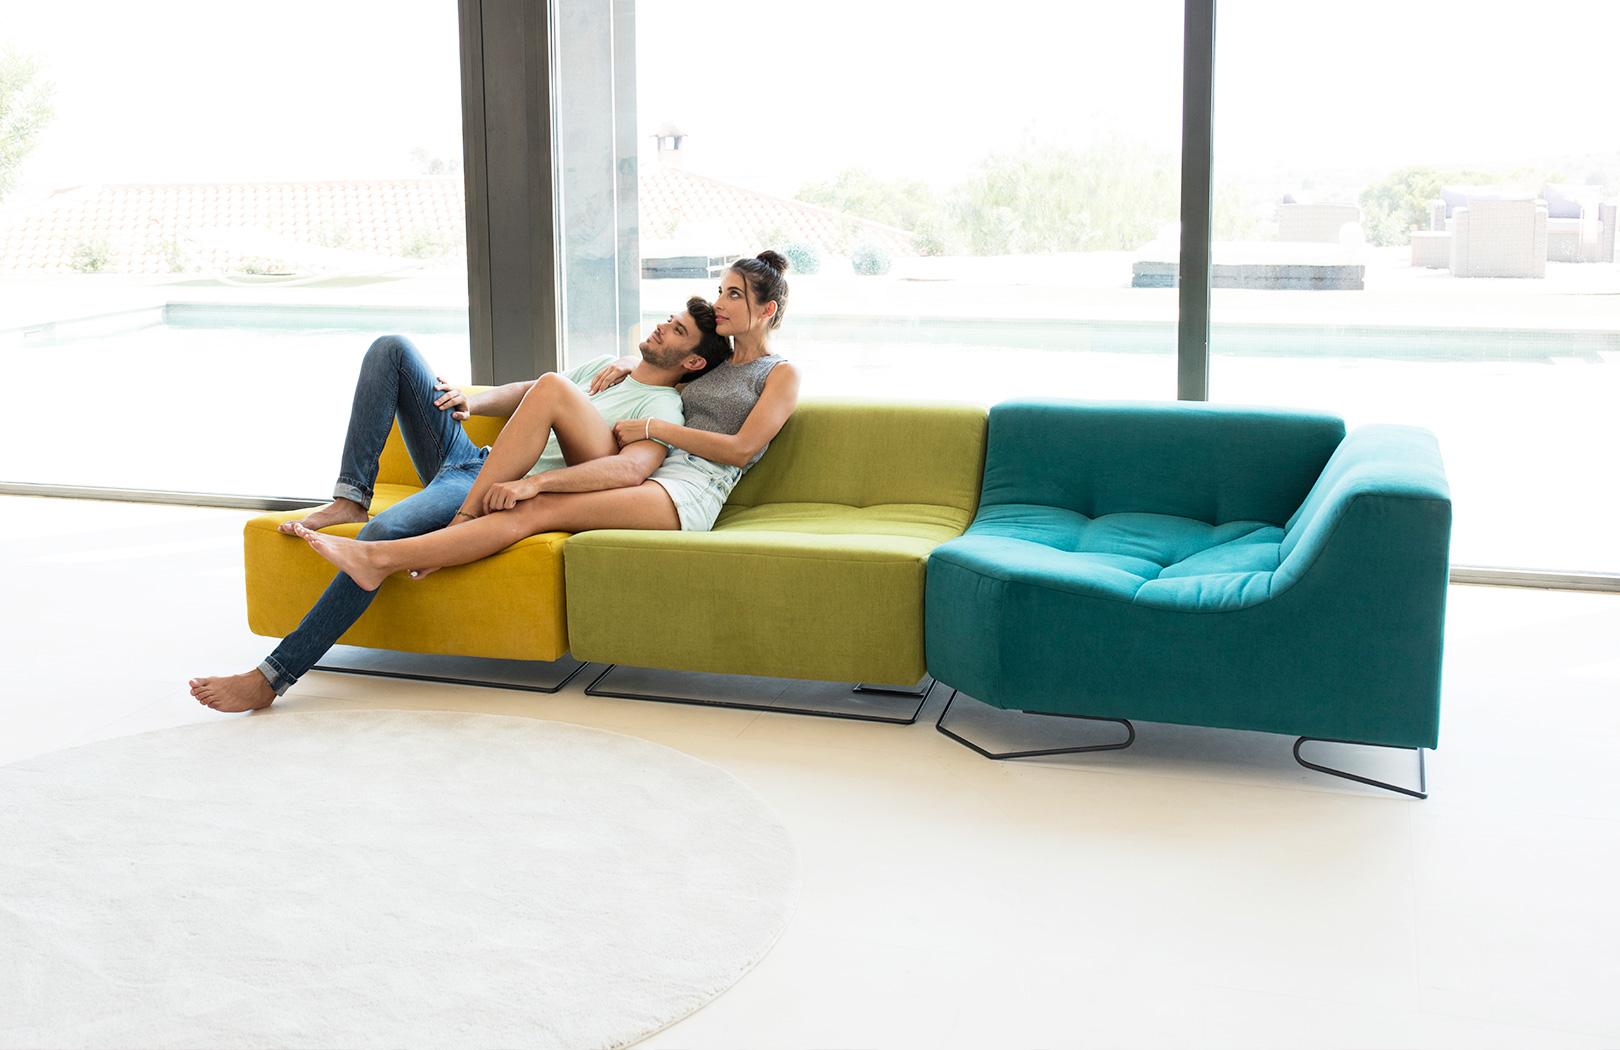 LuciPop Modular Sofa